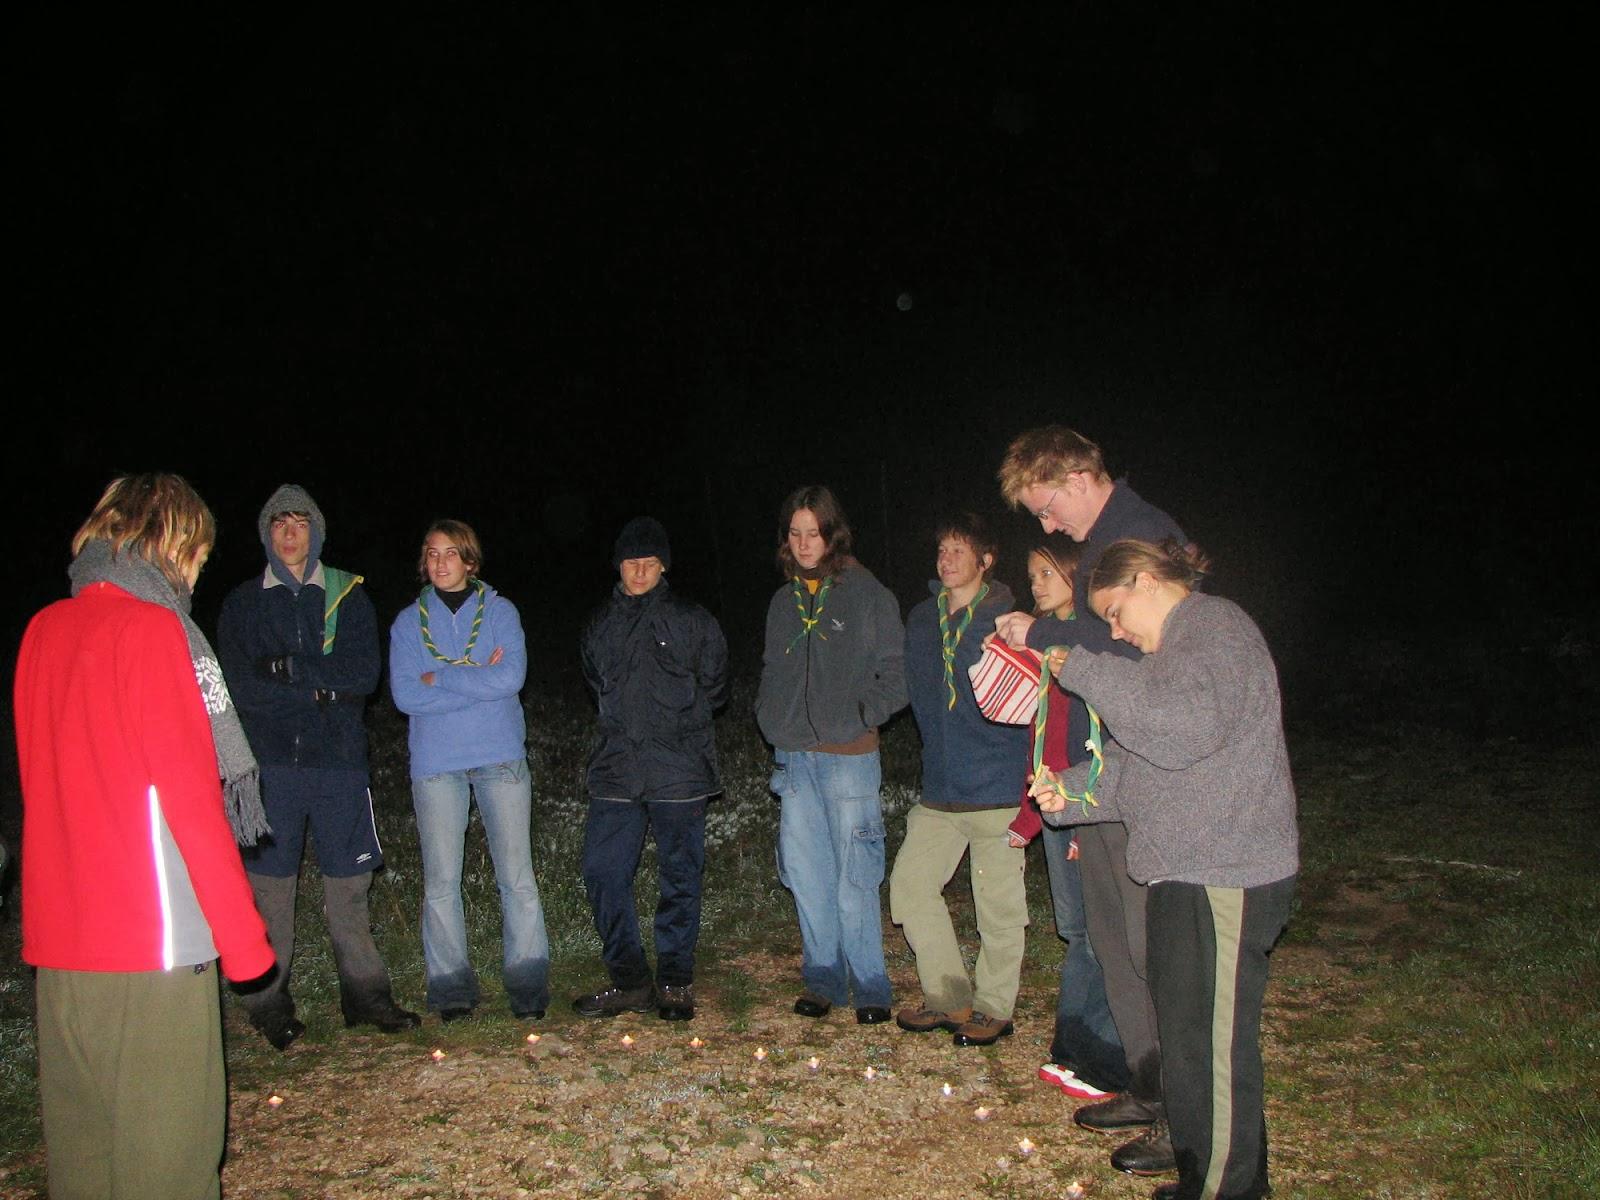 Prehod PP, Ilirska Bistrica 2005 - picture%2B075.jpg